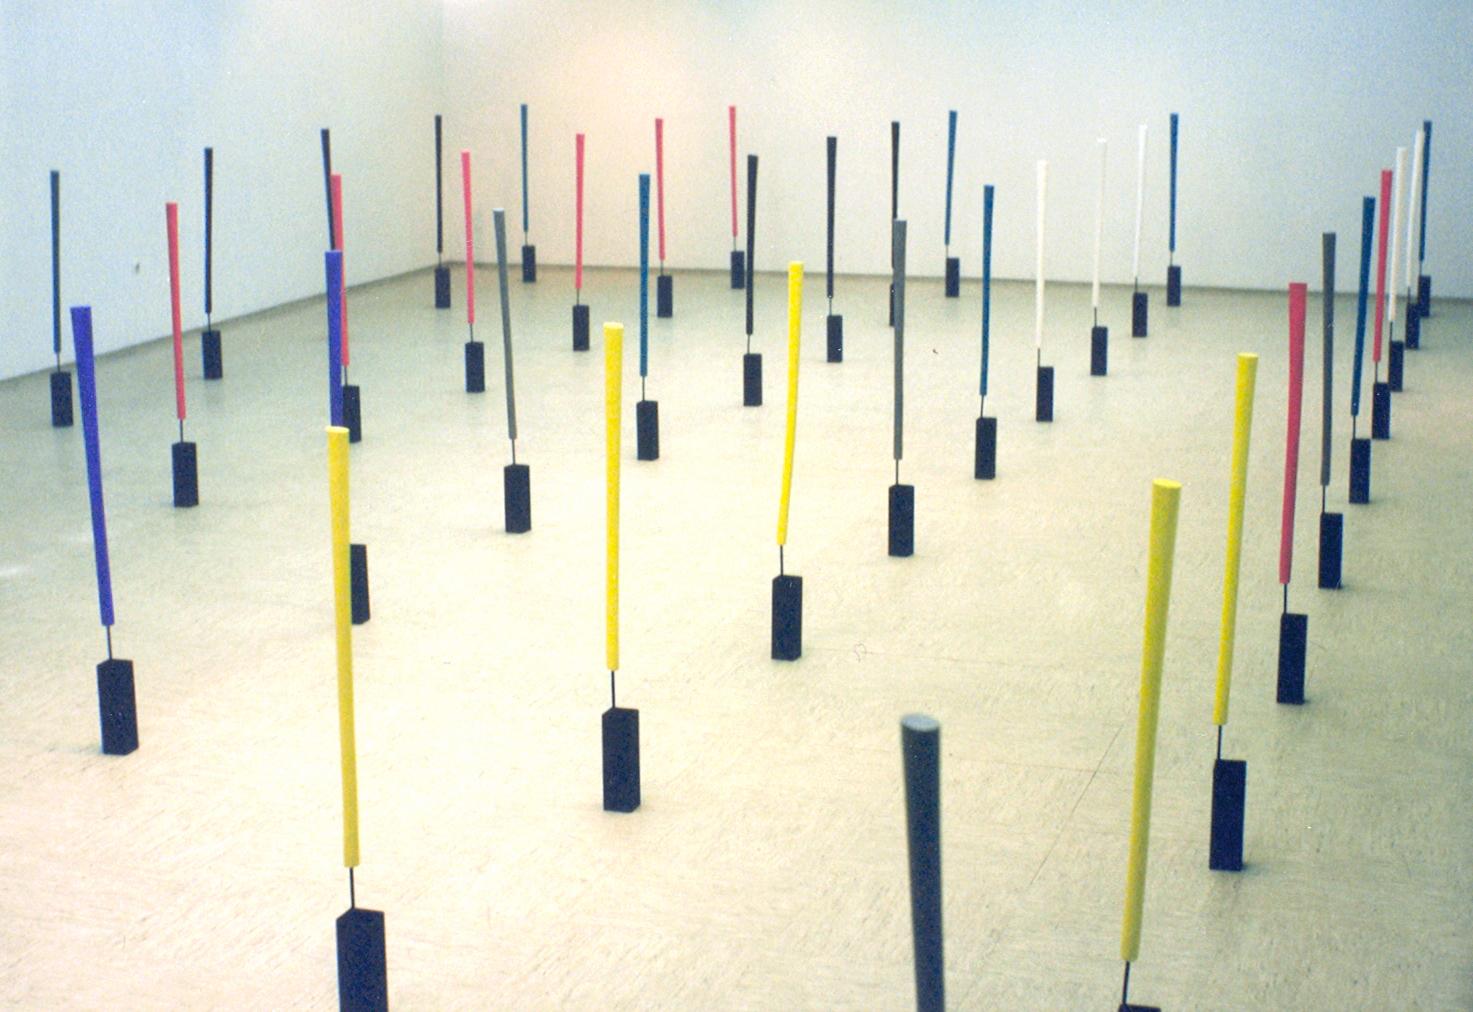 akril, les železo, 50 elementov, 1990